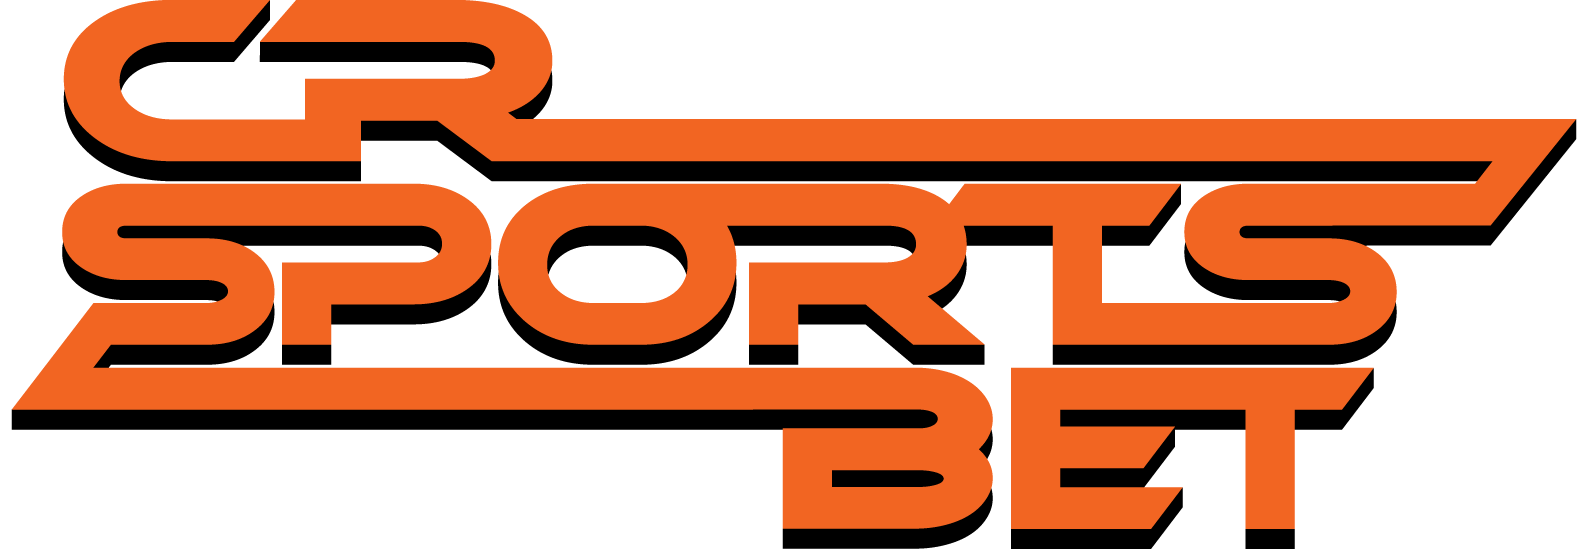 CRSportsBet Review Logo